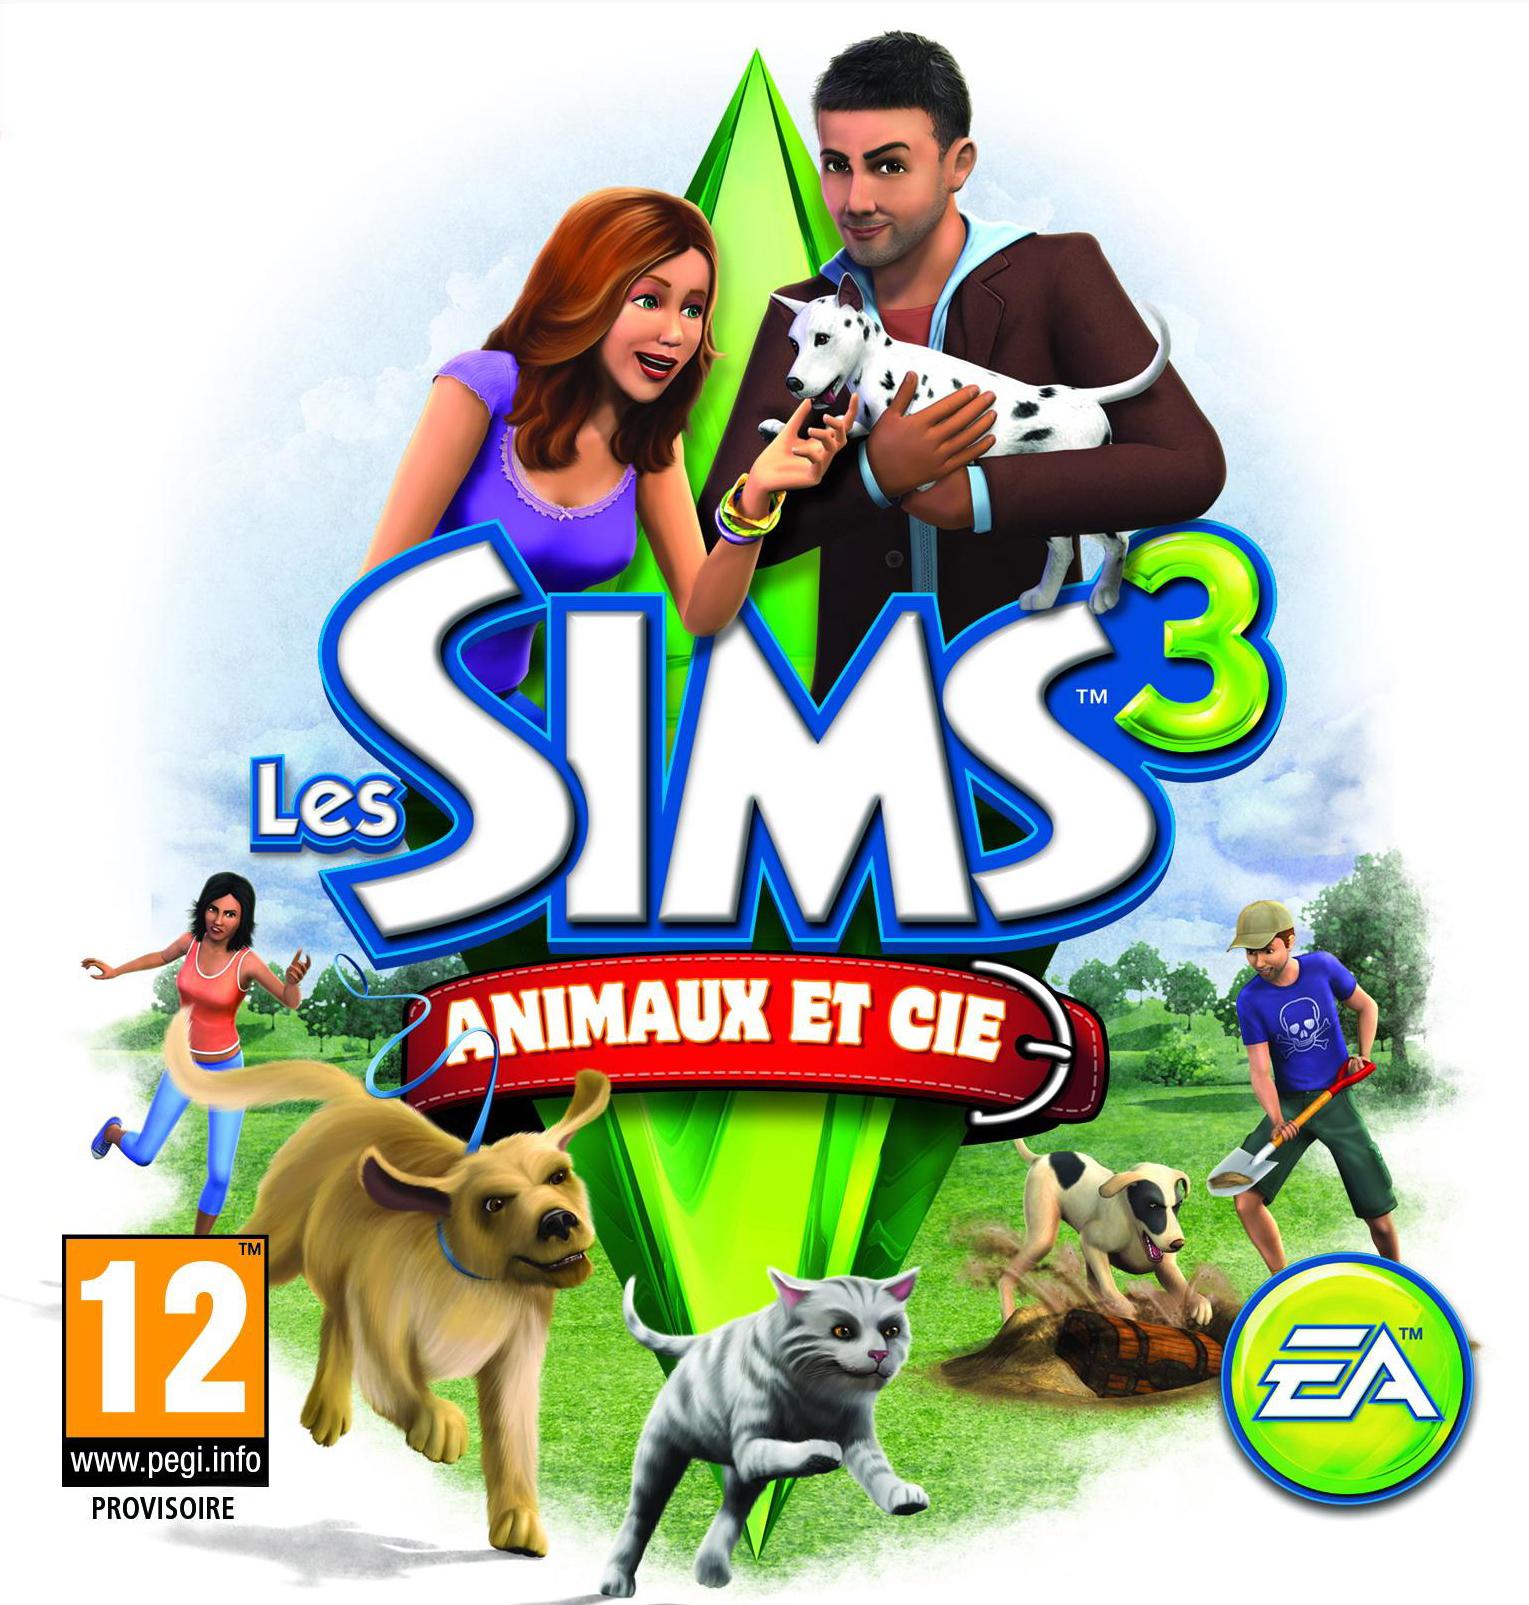 Animaux & Cie (PS3 & Xbox 360) - Les Sims Wiki - Les Sims, Les Sims 2